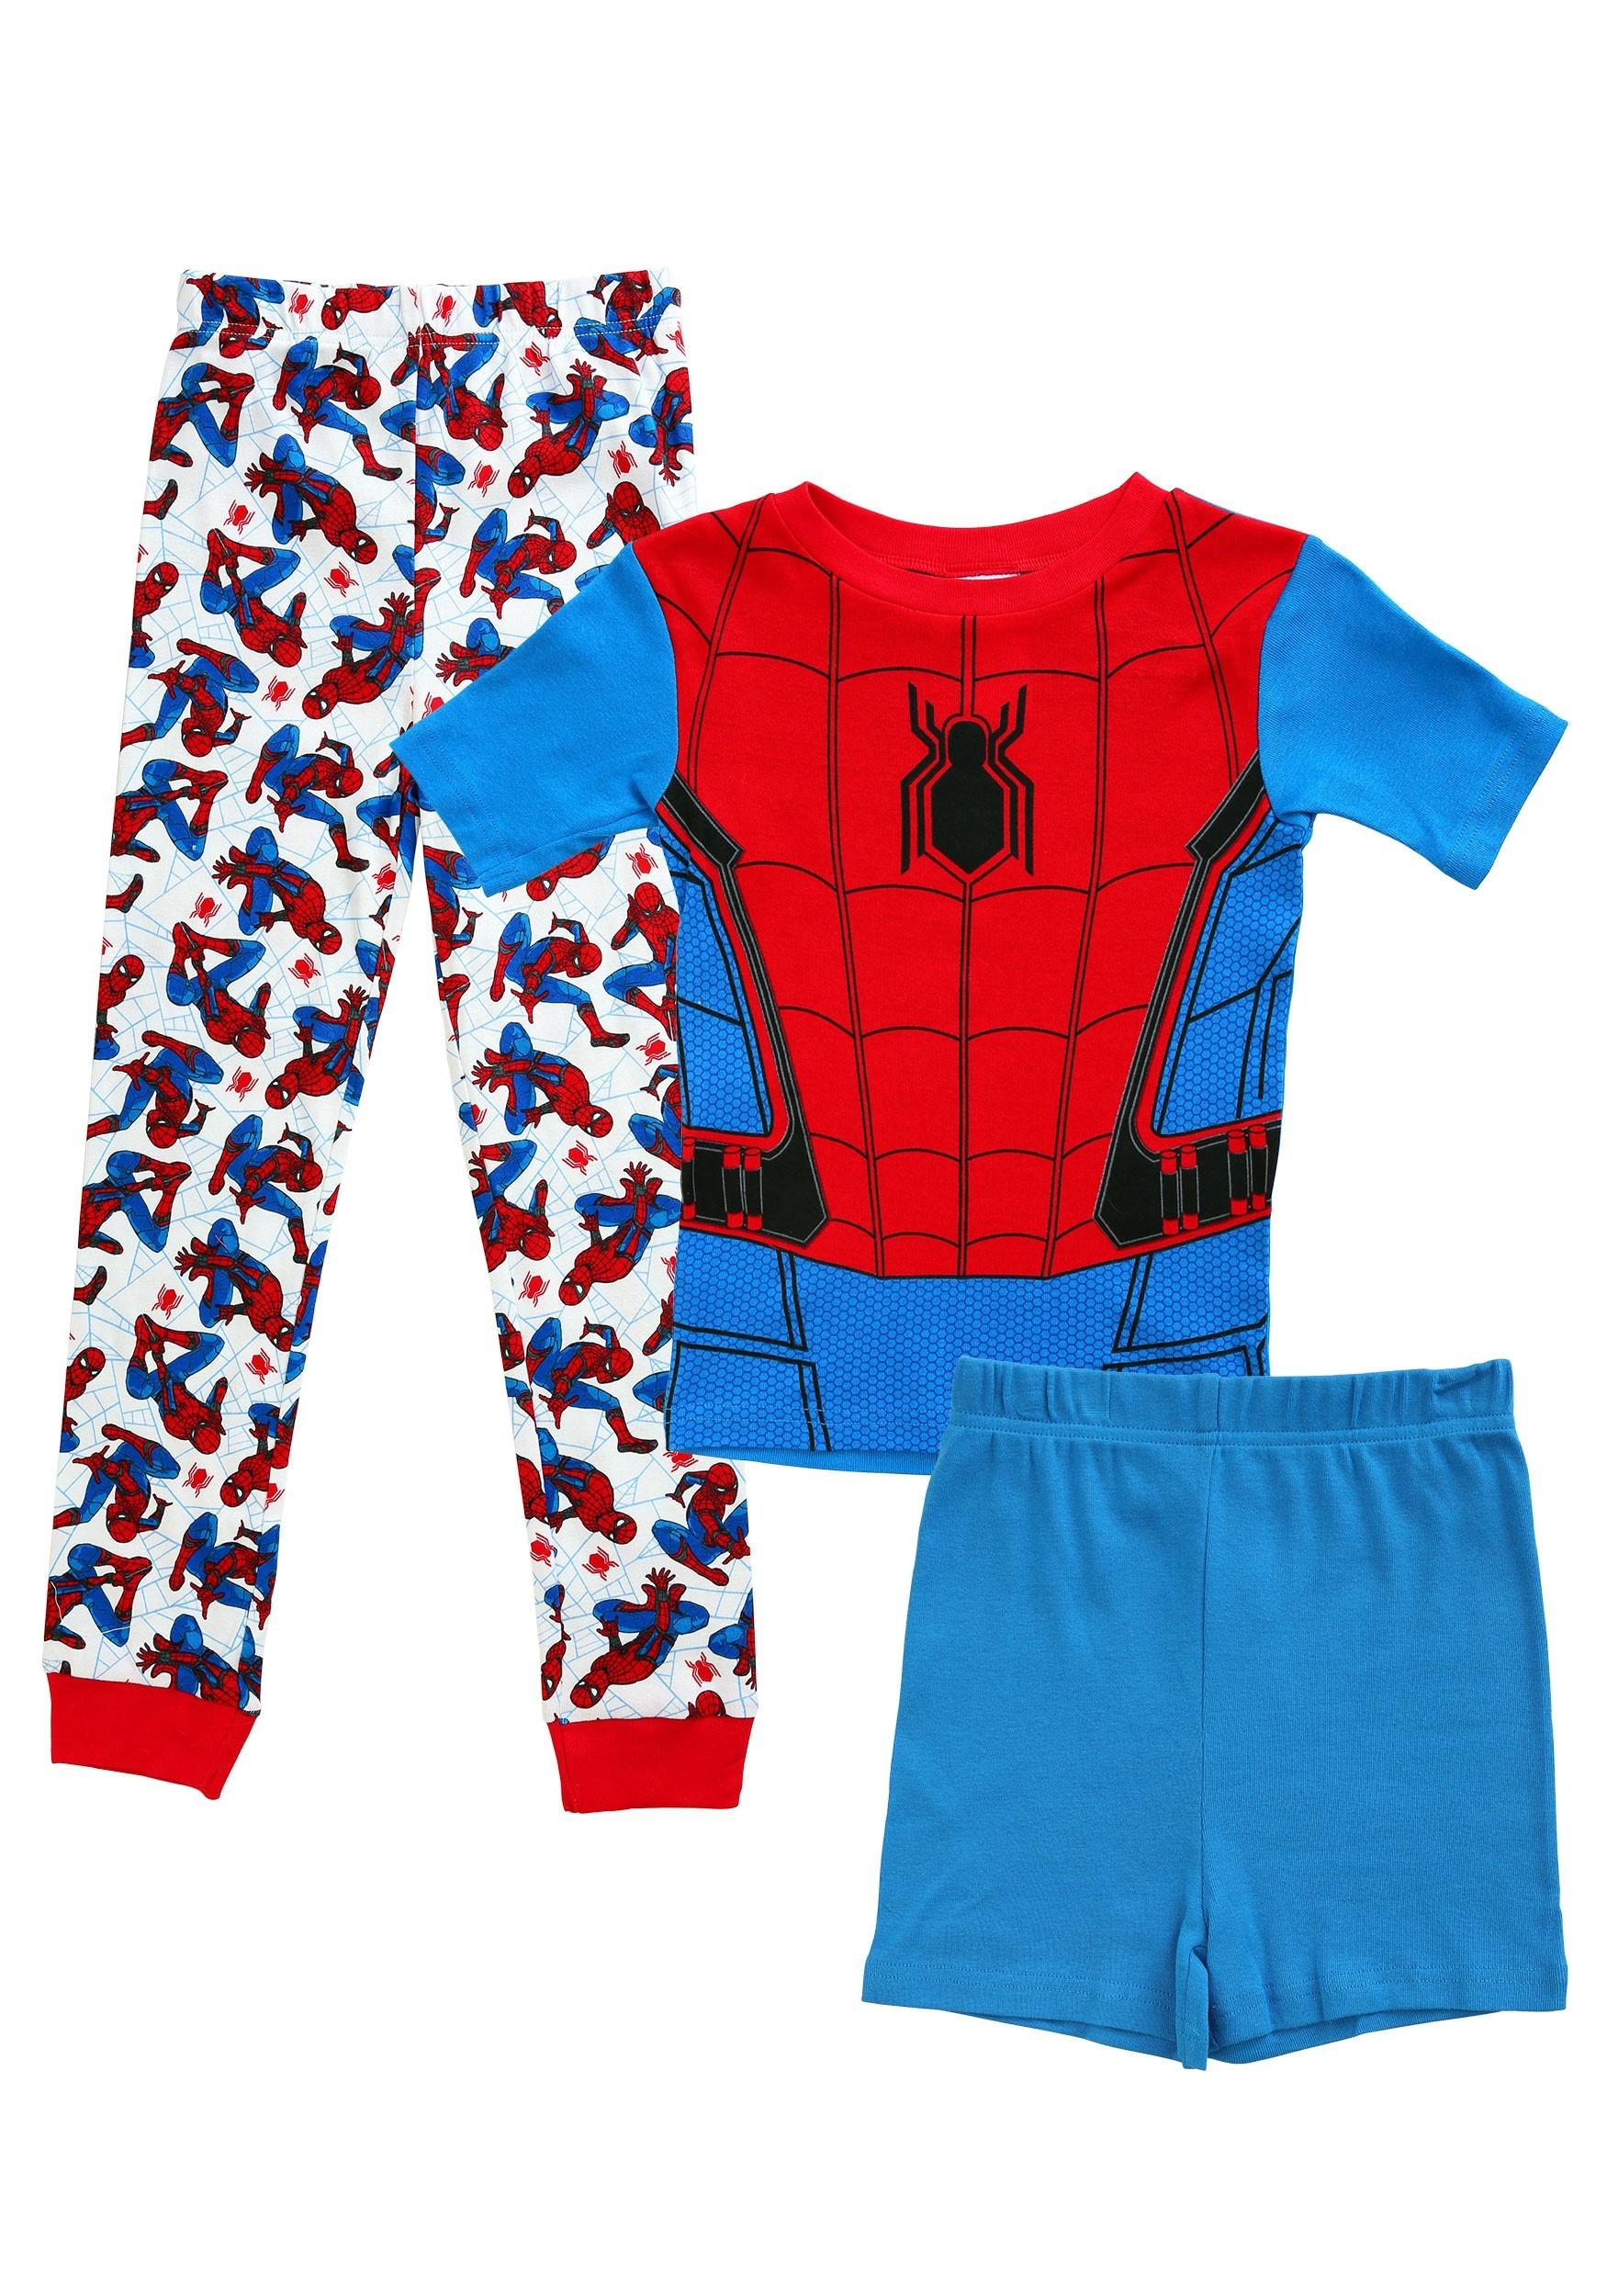 f6f3886b5ec63 Spider-Man Boy s 3 Piece Pajama Set Update Main